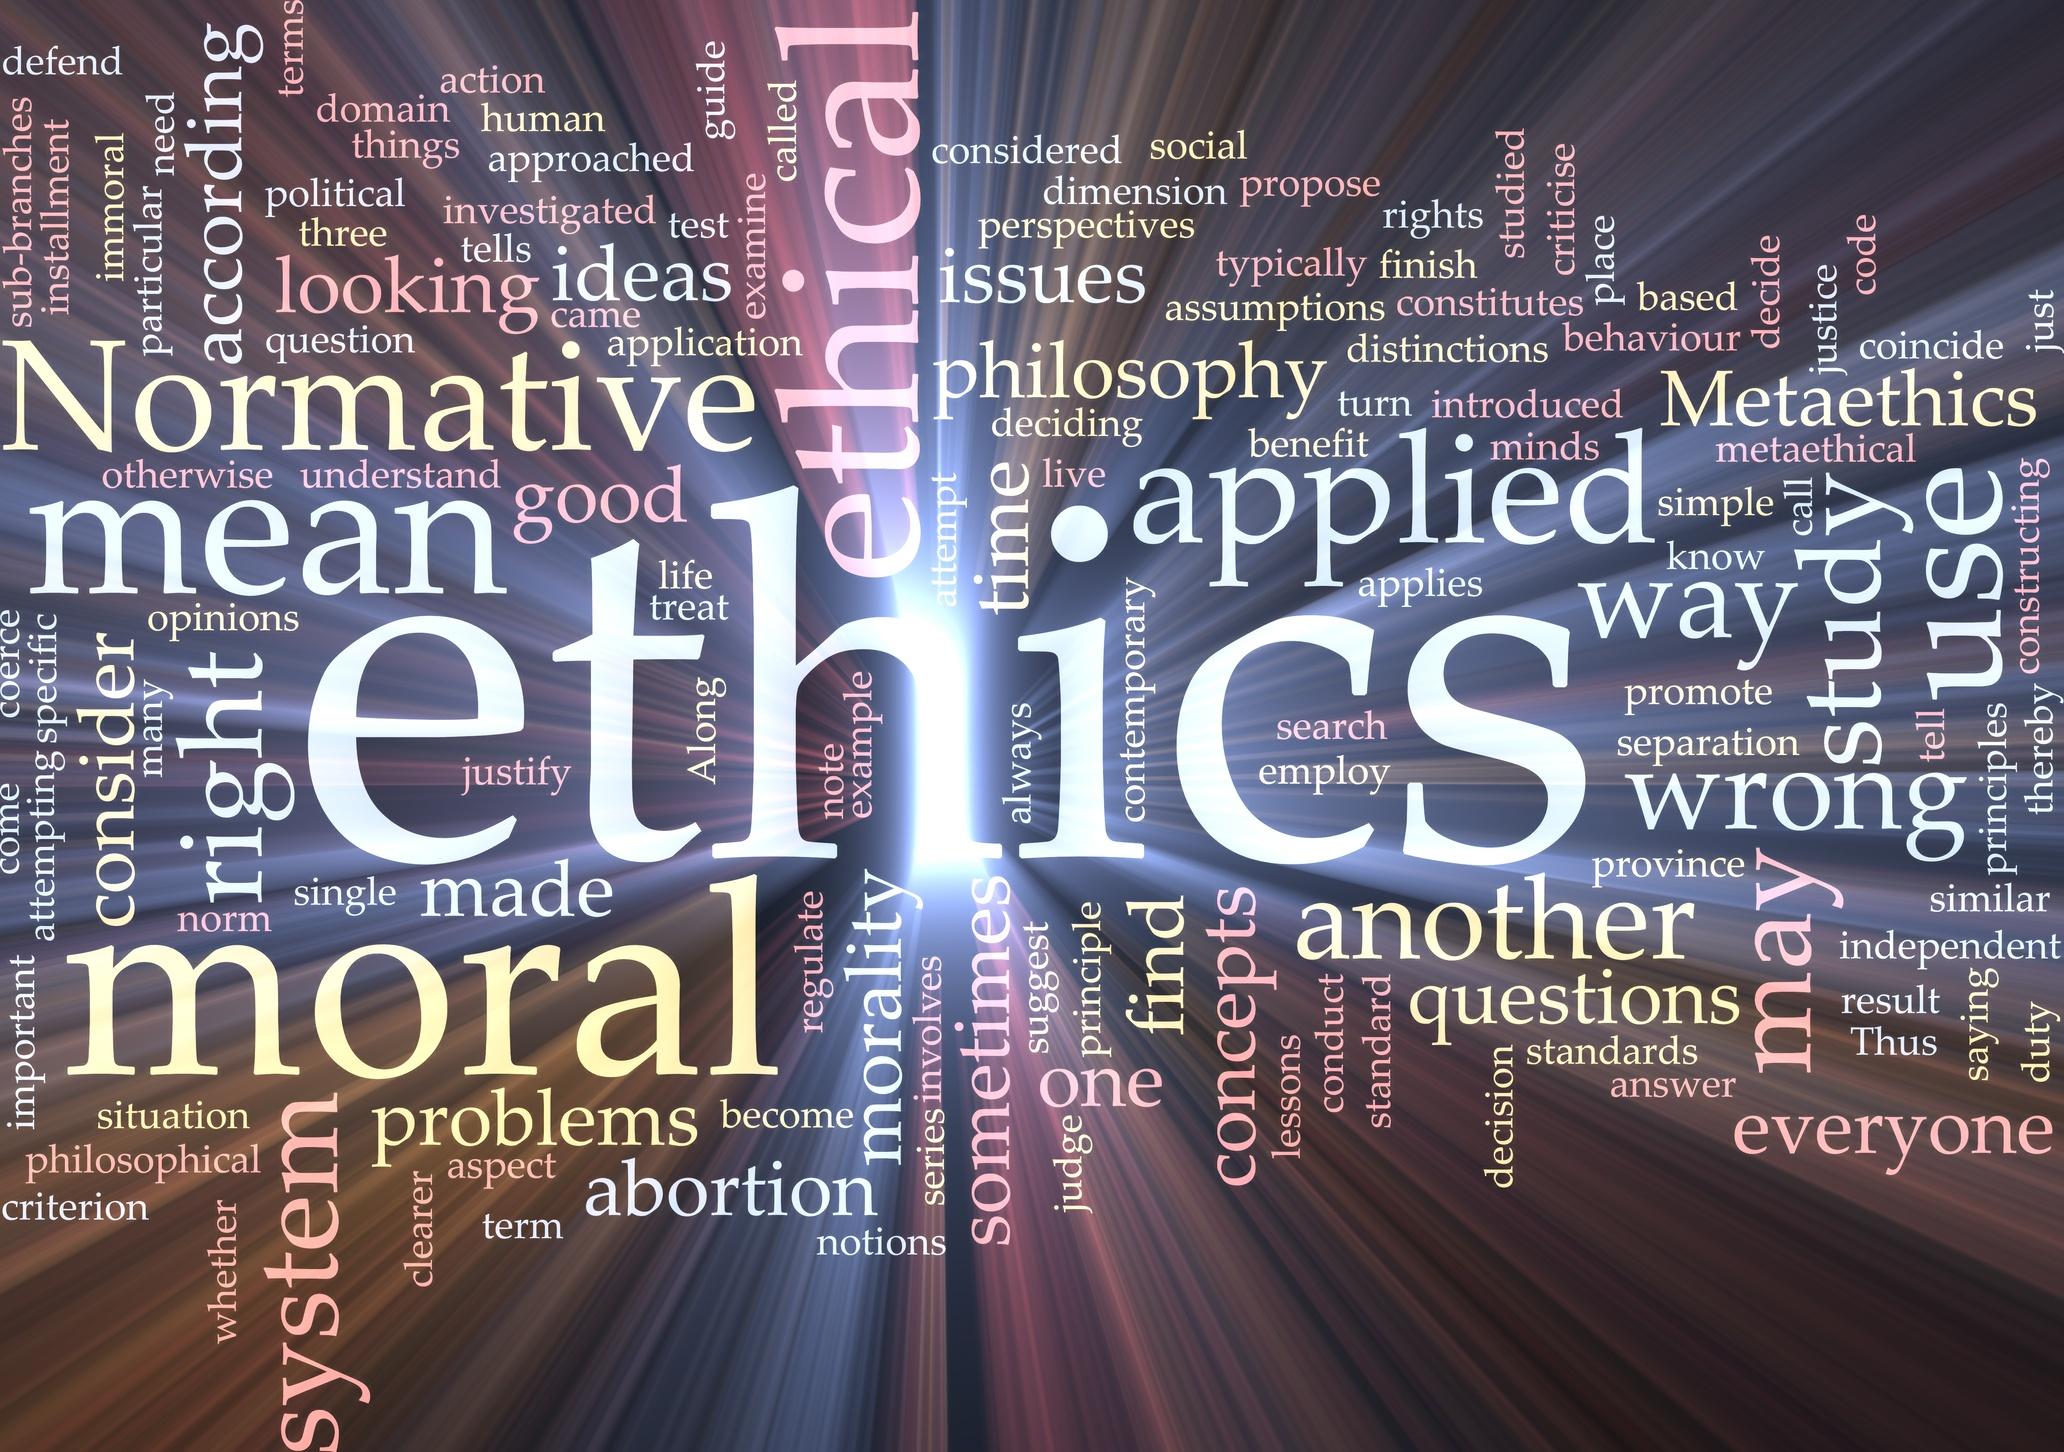 organizational ethics and conduct training